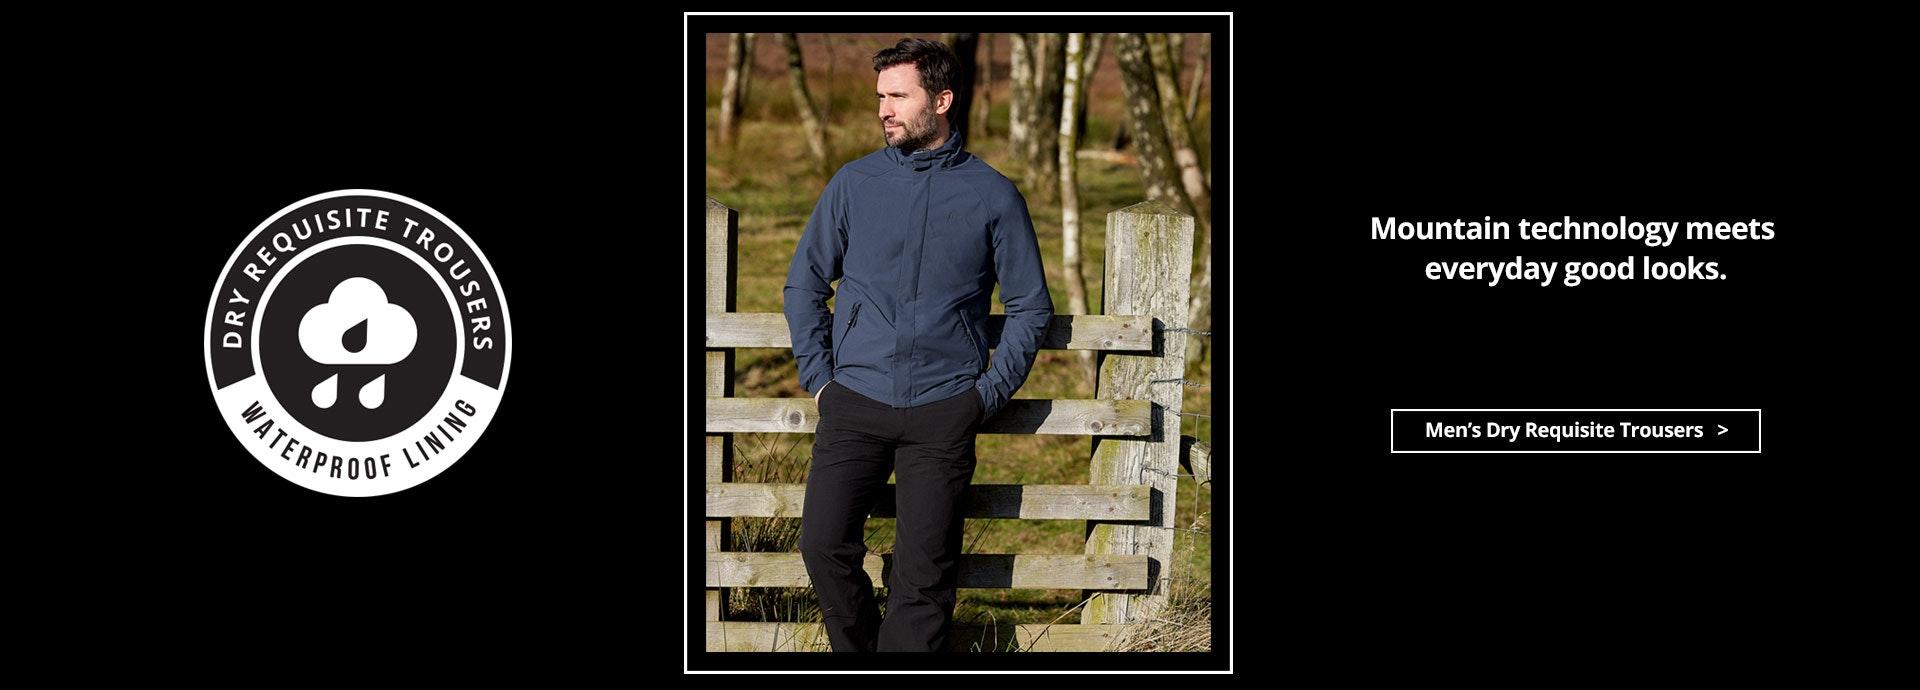 Men's Dry Requisite Trousers